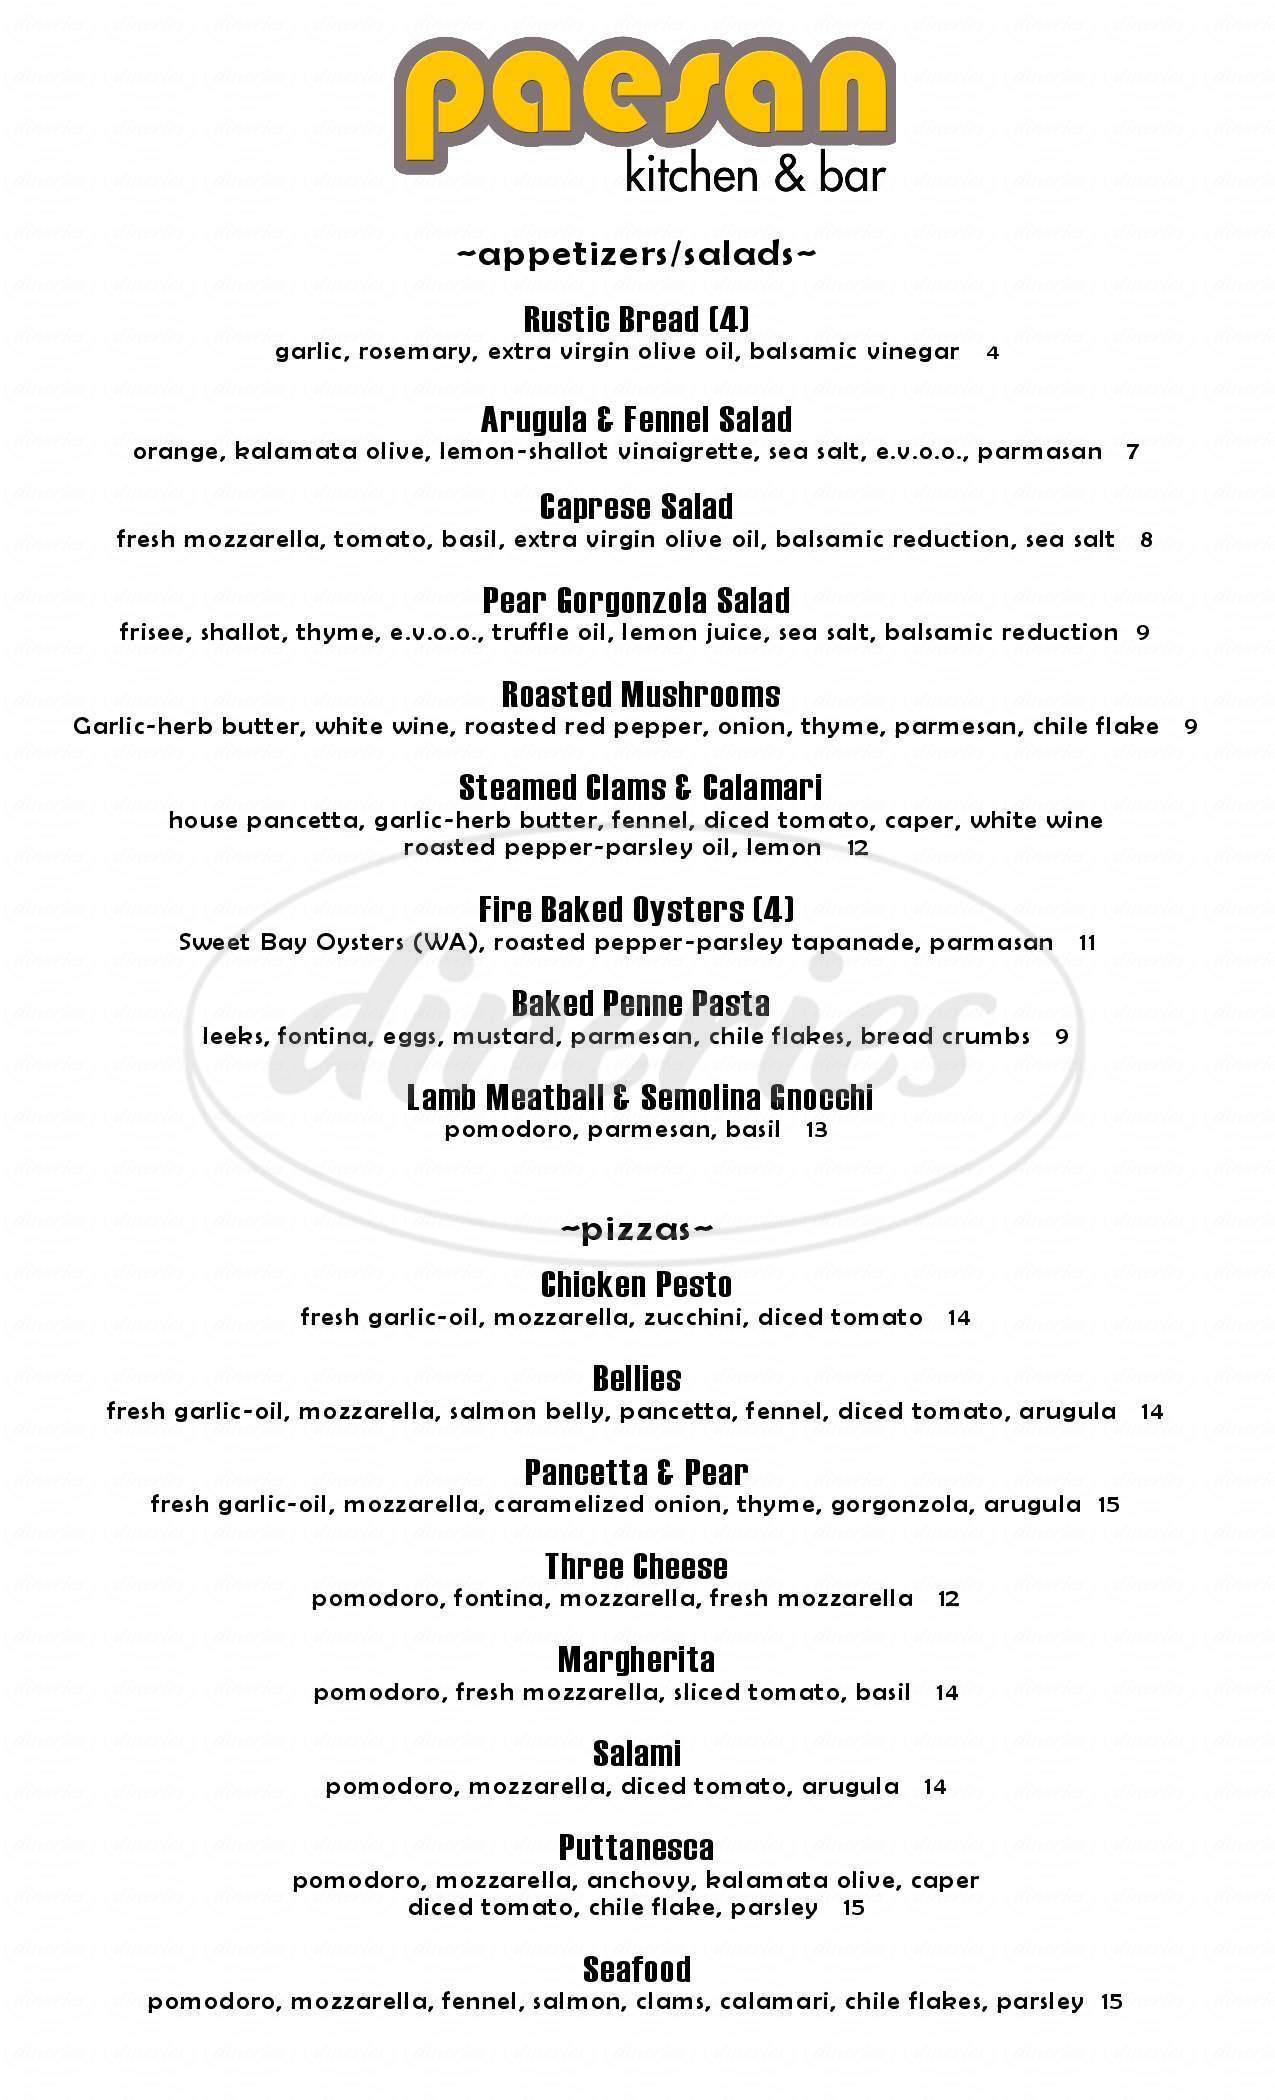 menu for Paesan Kitchen & Bar